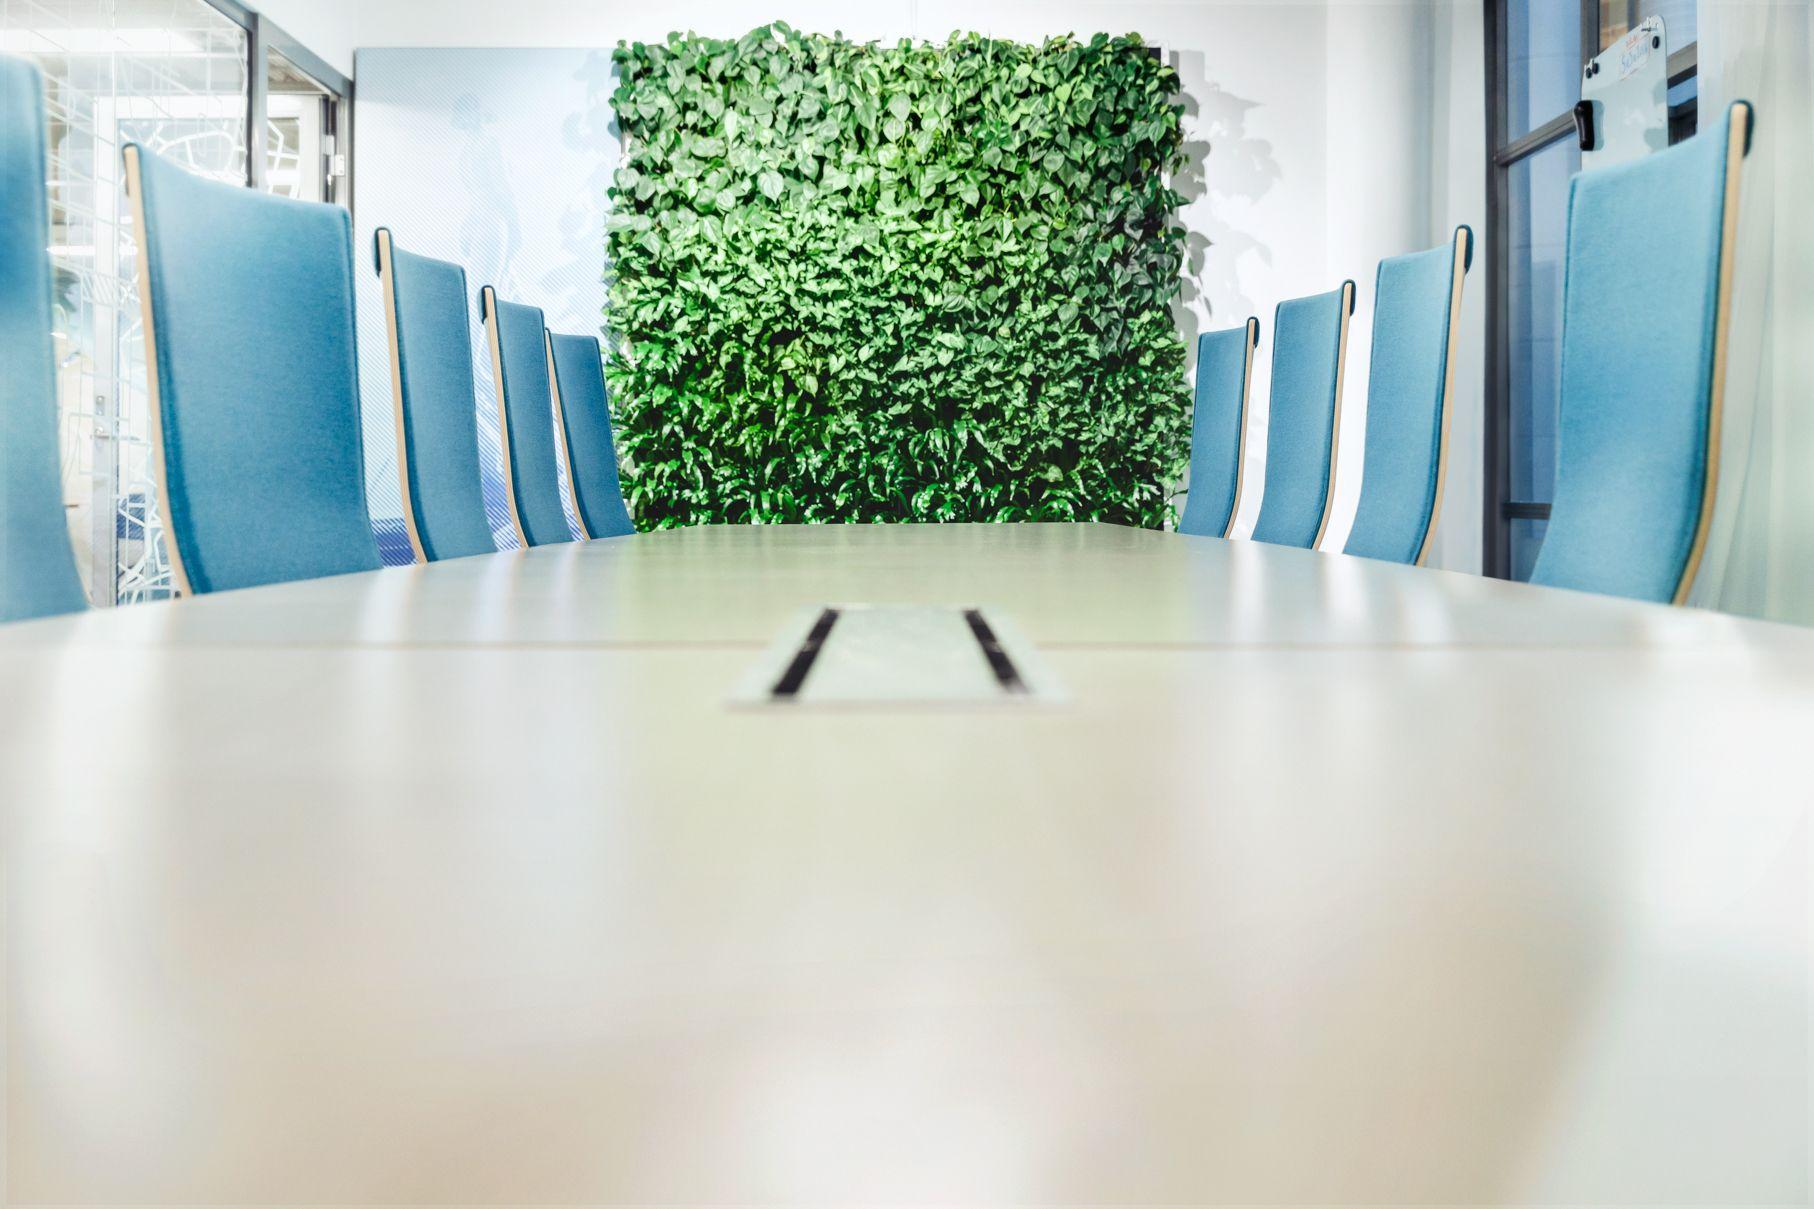 Naava Smart Green Wall At Svea Ekonomi Meeting Room Naava Smart  # Muebles Ekono Cali